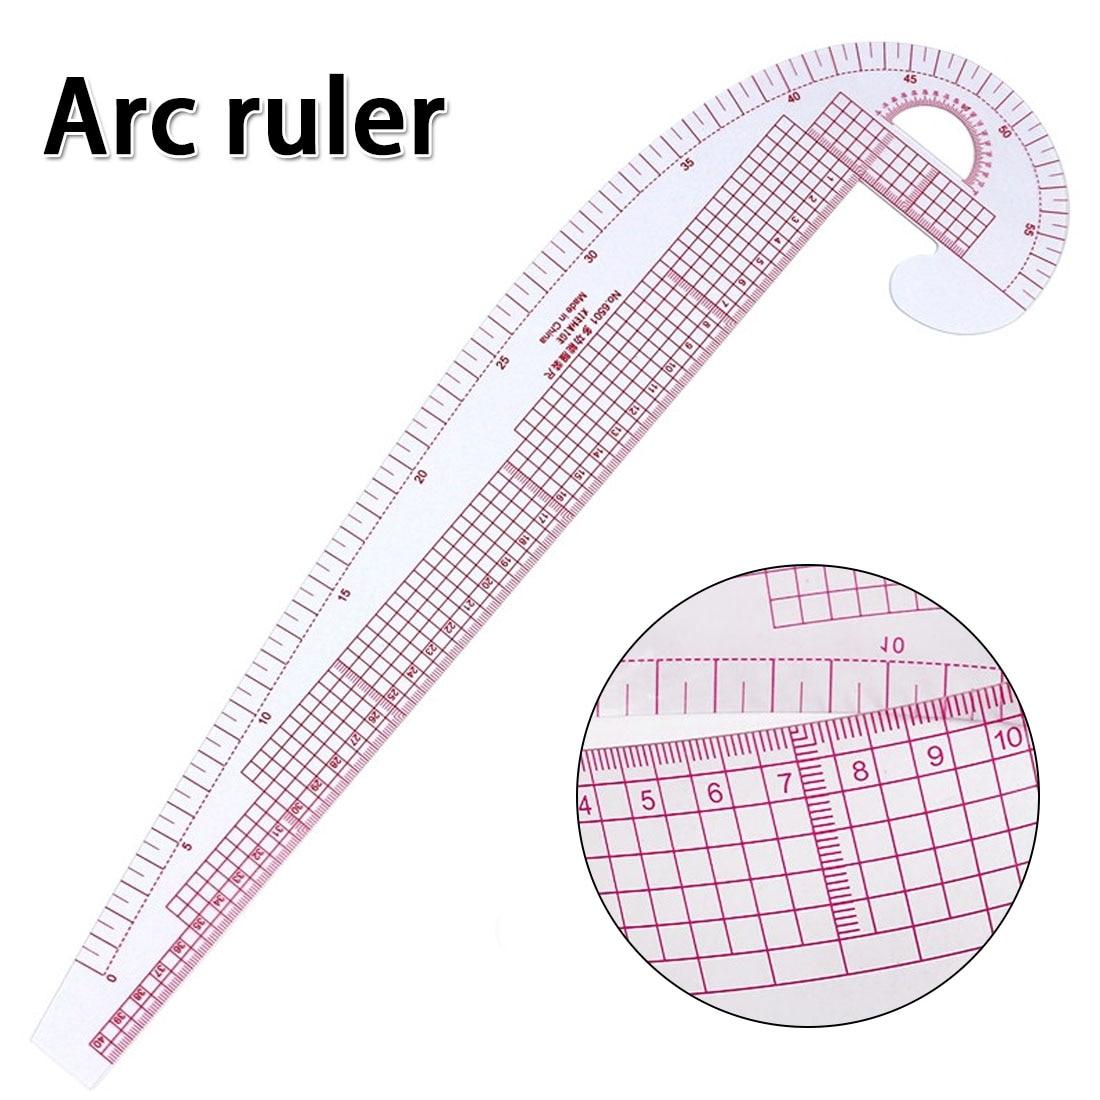 Clothing Arc Ruler  Multi-function Curve Ruler Yardstick Drawing Tool Clothing Ruler Sleeve Shirt Ruler Arc Ruler